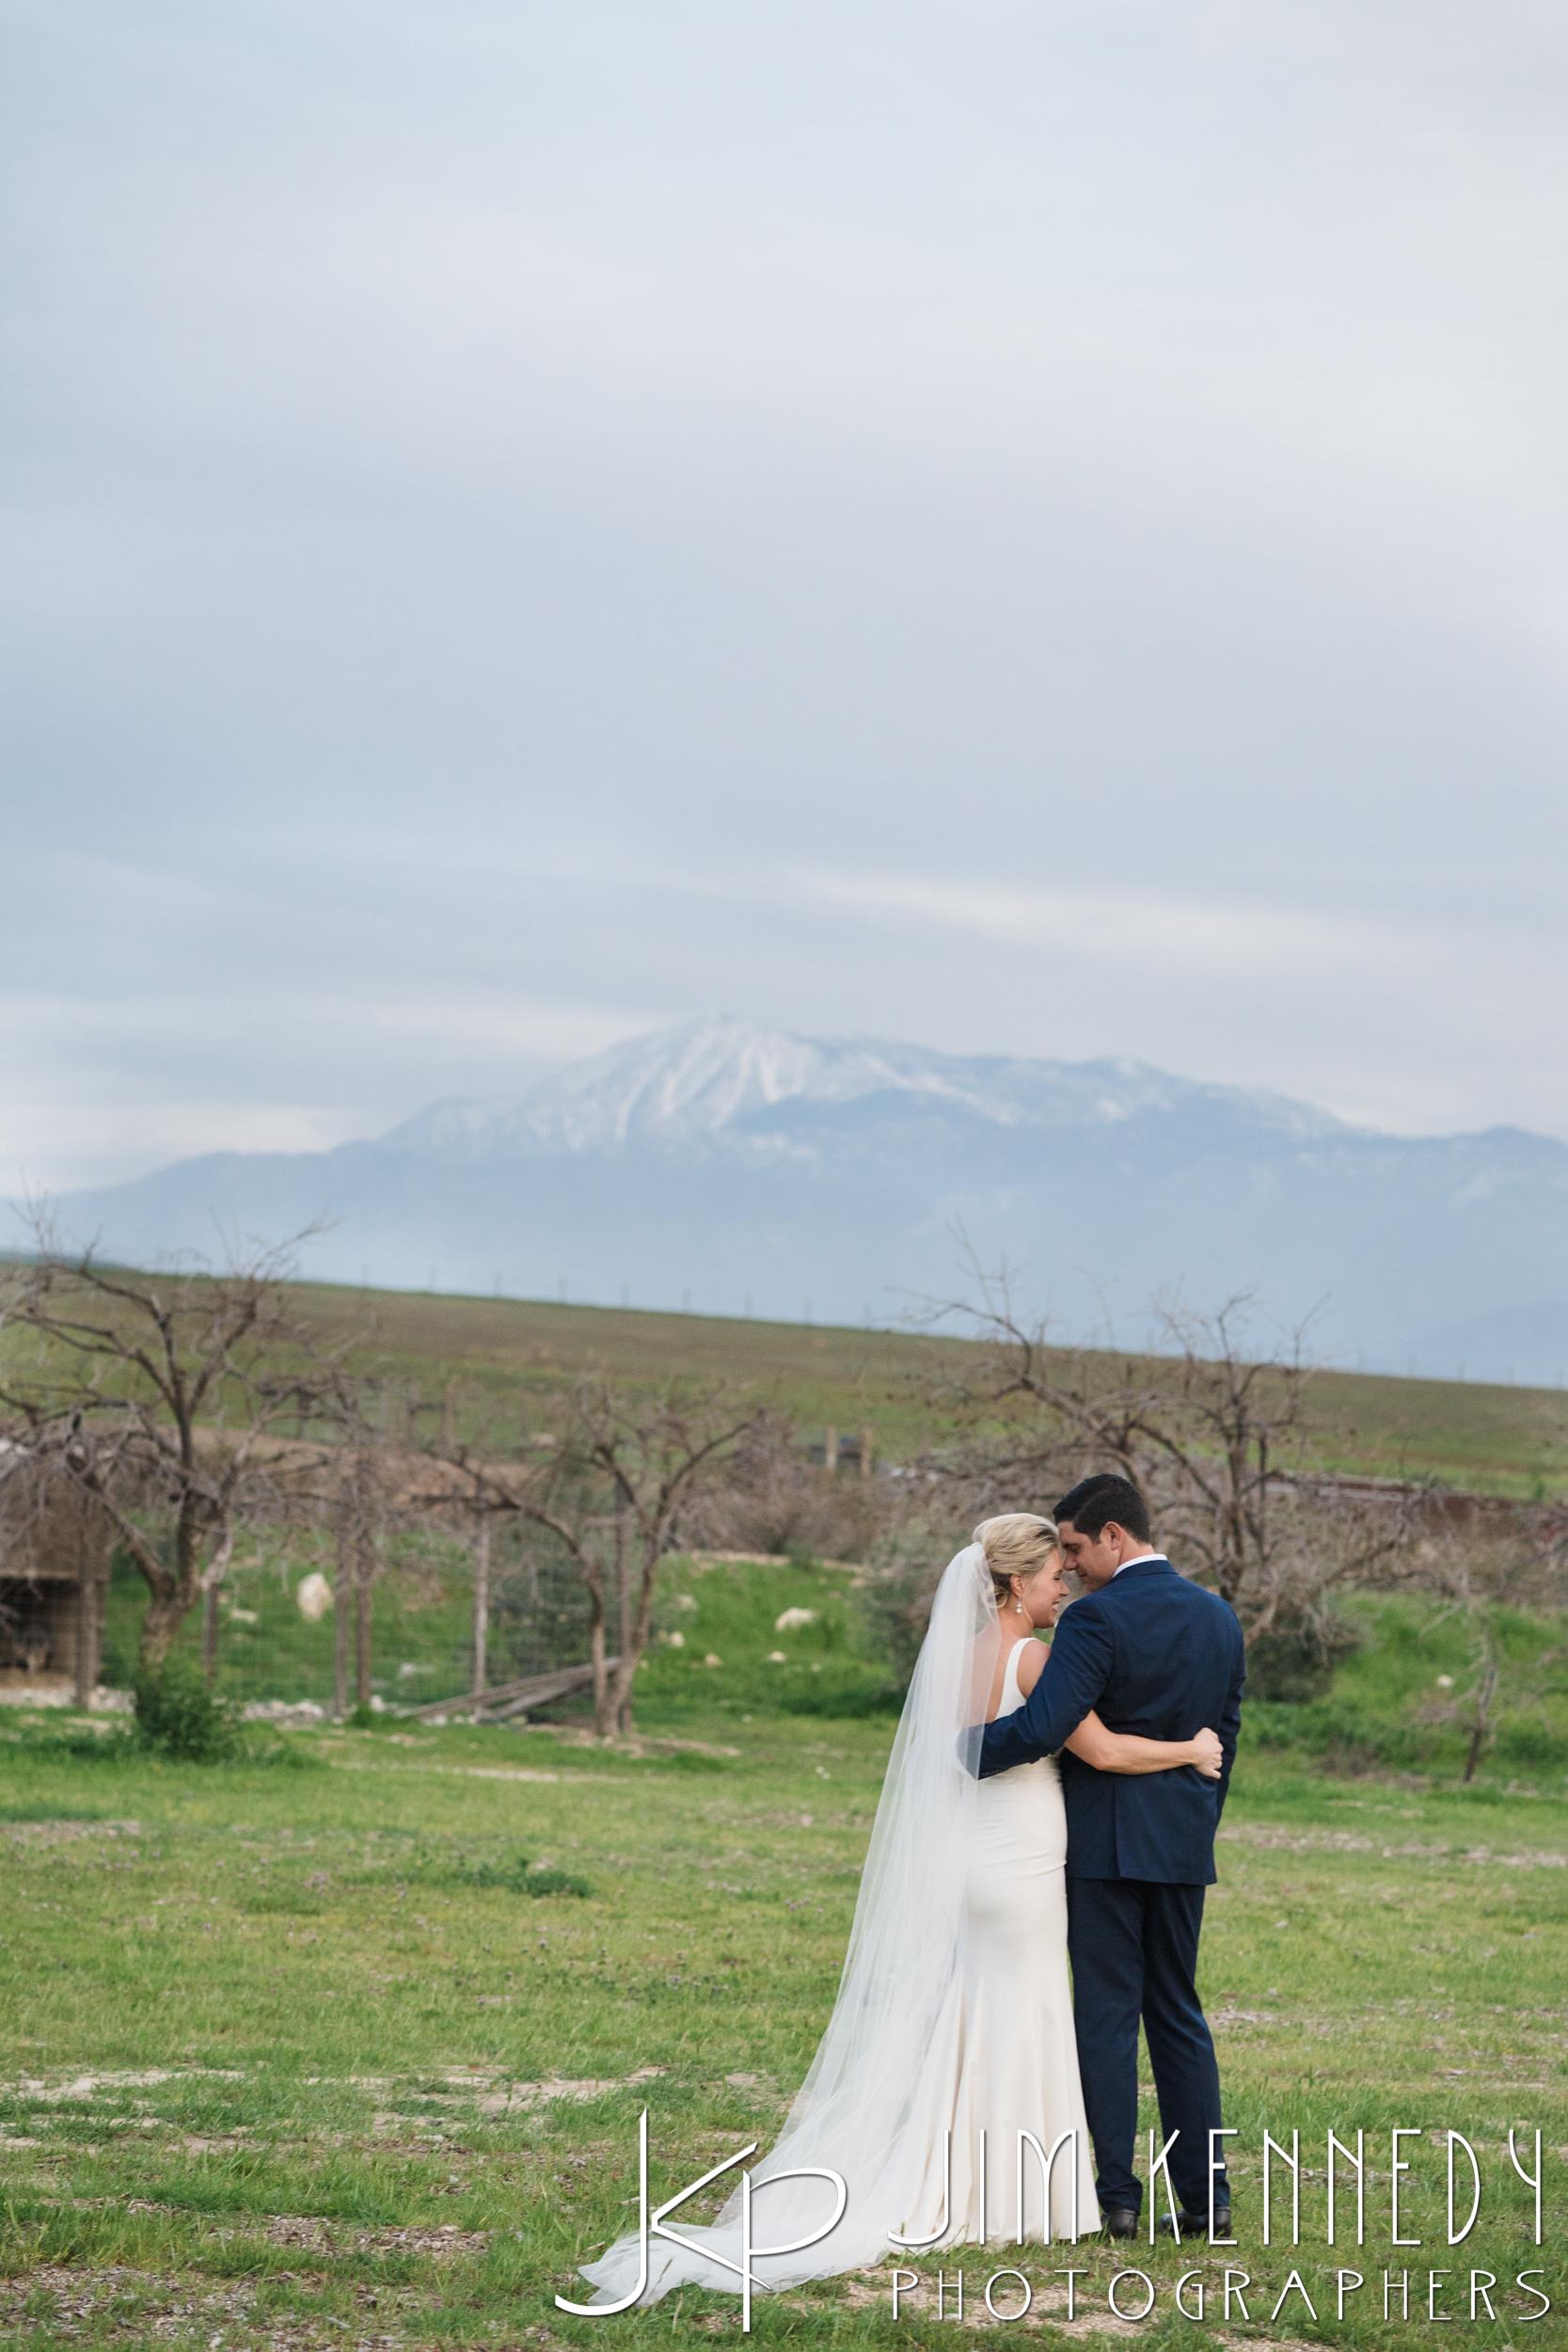 jim_kennedy_photographers_highland_springs_wedding_caitlyn_0144.jpg